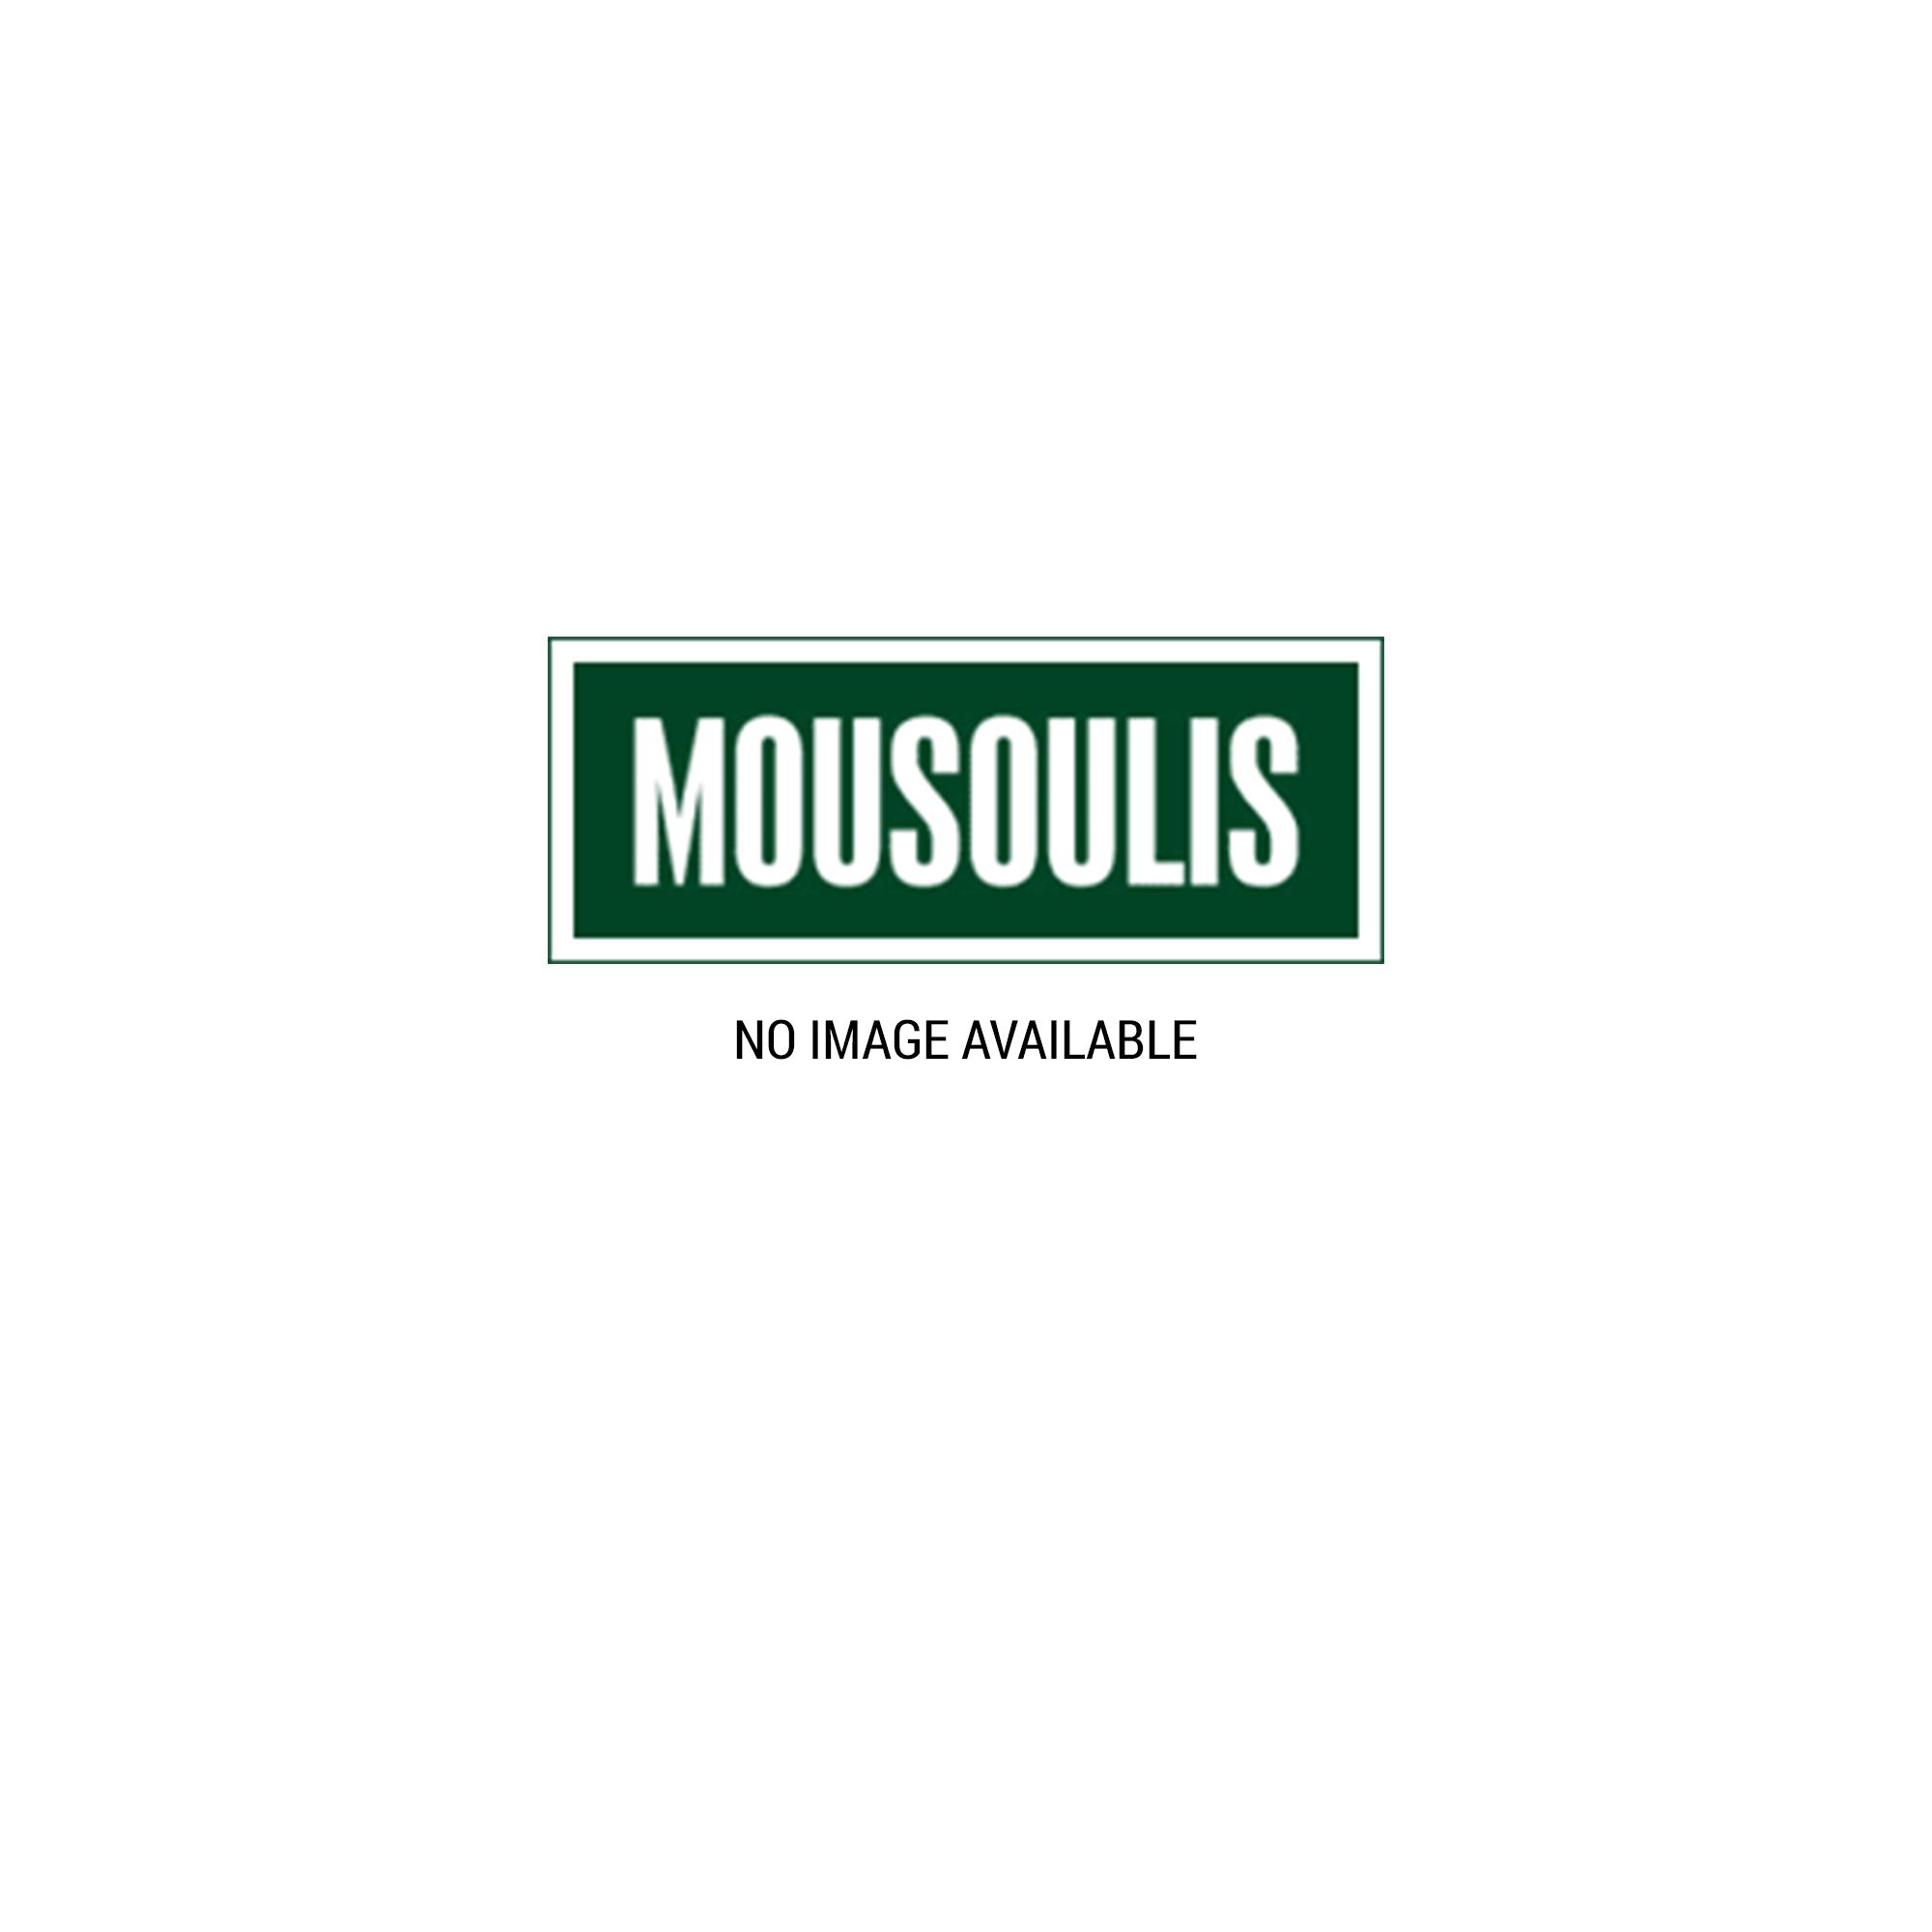 1d99eb075b4f Mcs Polo Μπλούζα Κλασική Μονόχρωμη με Λογότυπο Κανονική Γραμμή IMCP424S  L0005406 Ραφ